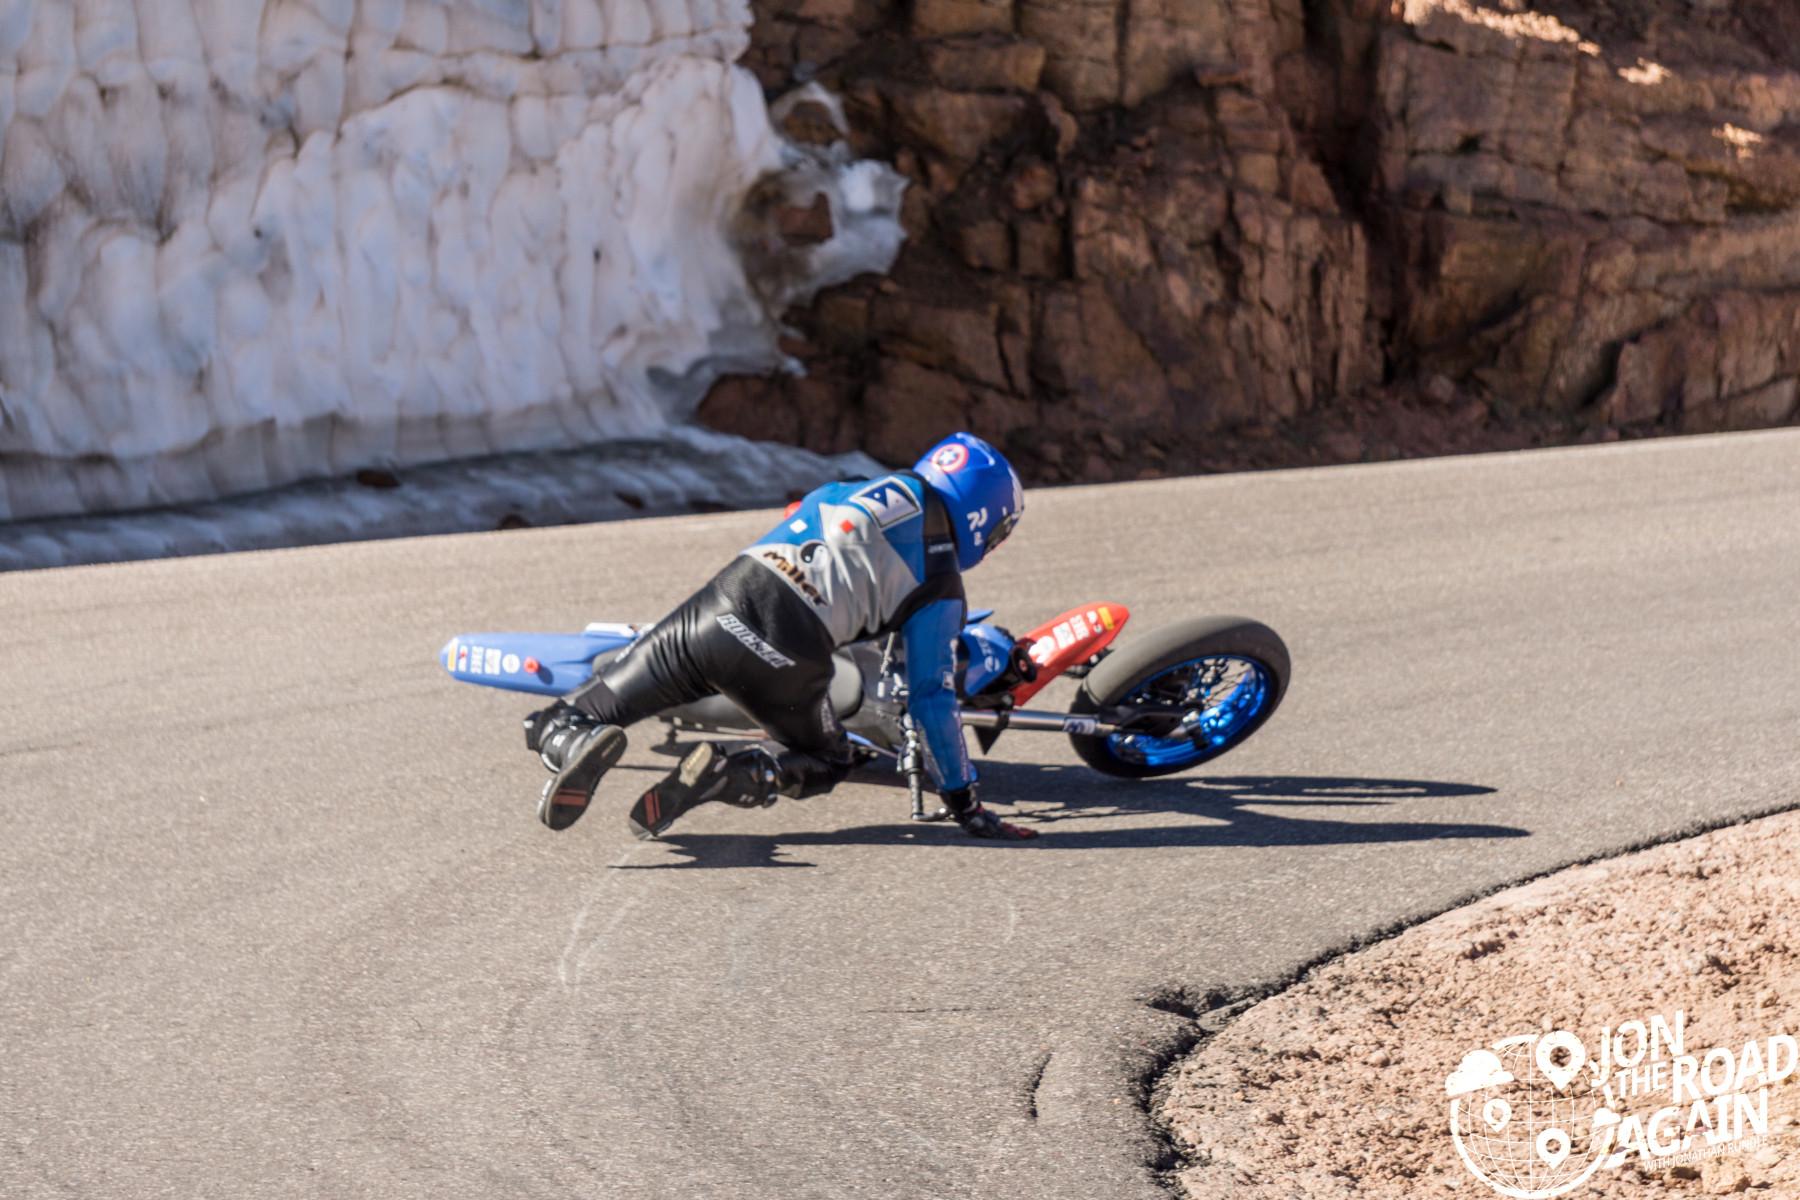 Pikes Peak Hill Climb Motorcycle Crash